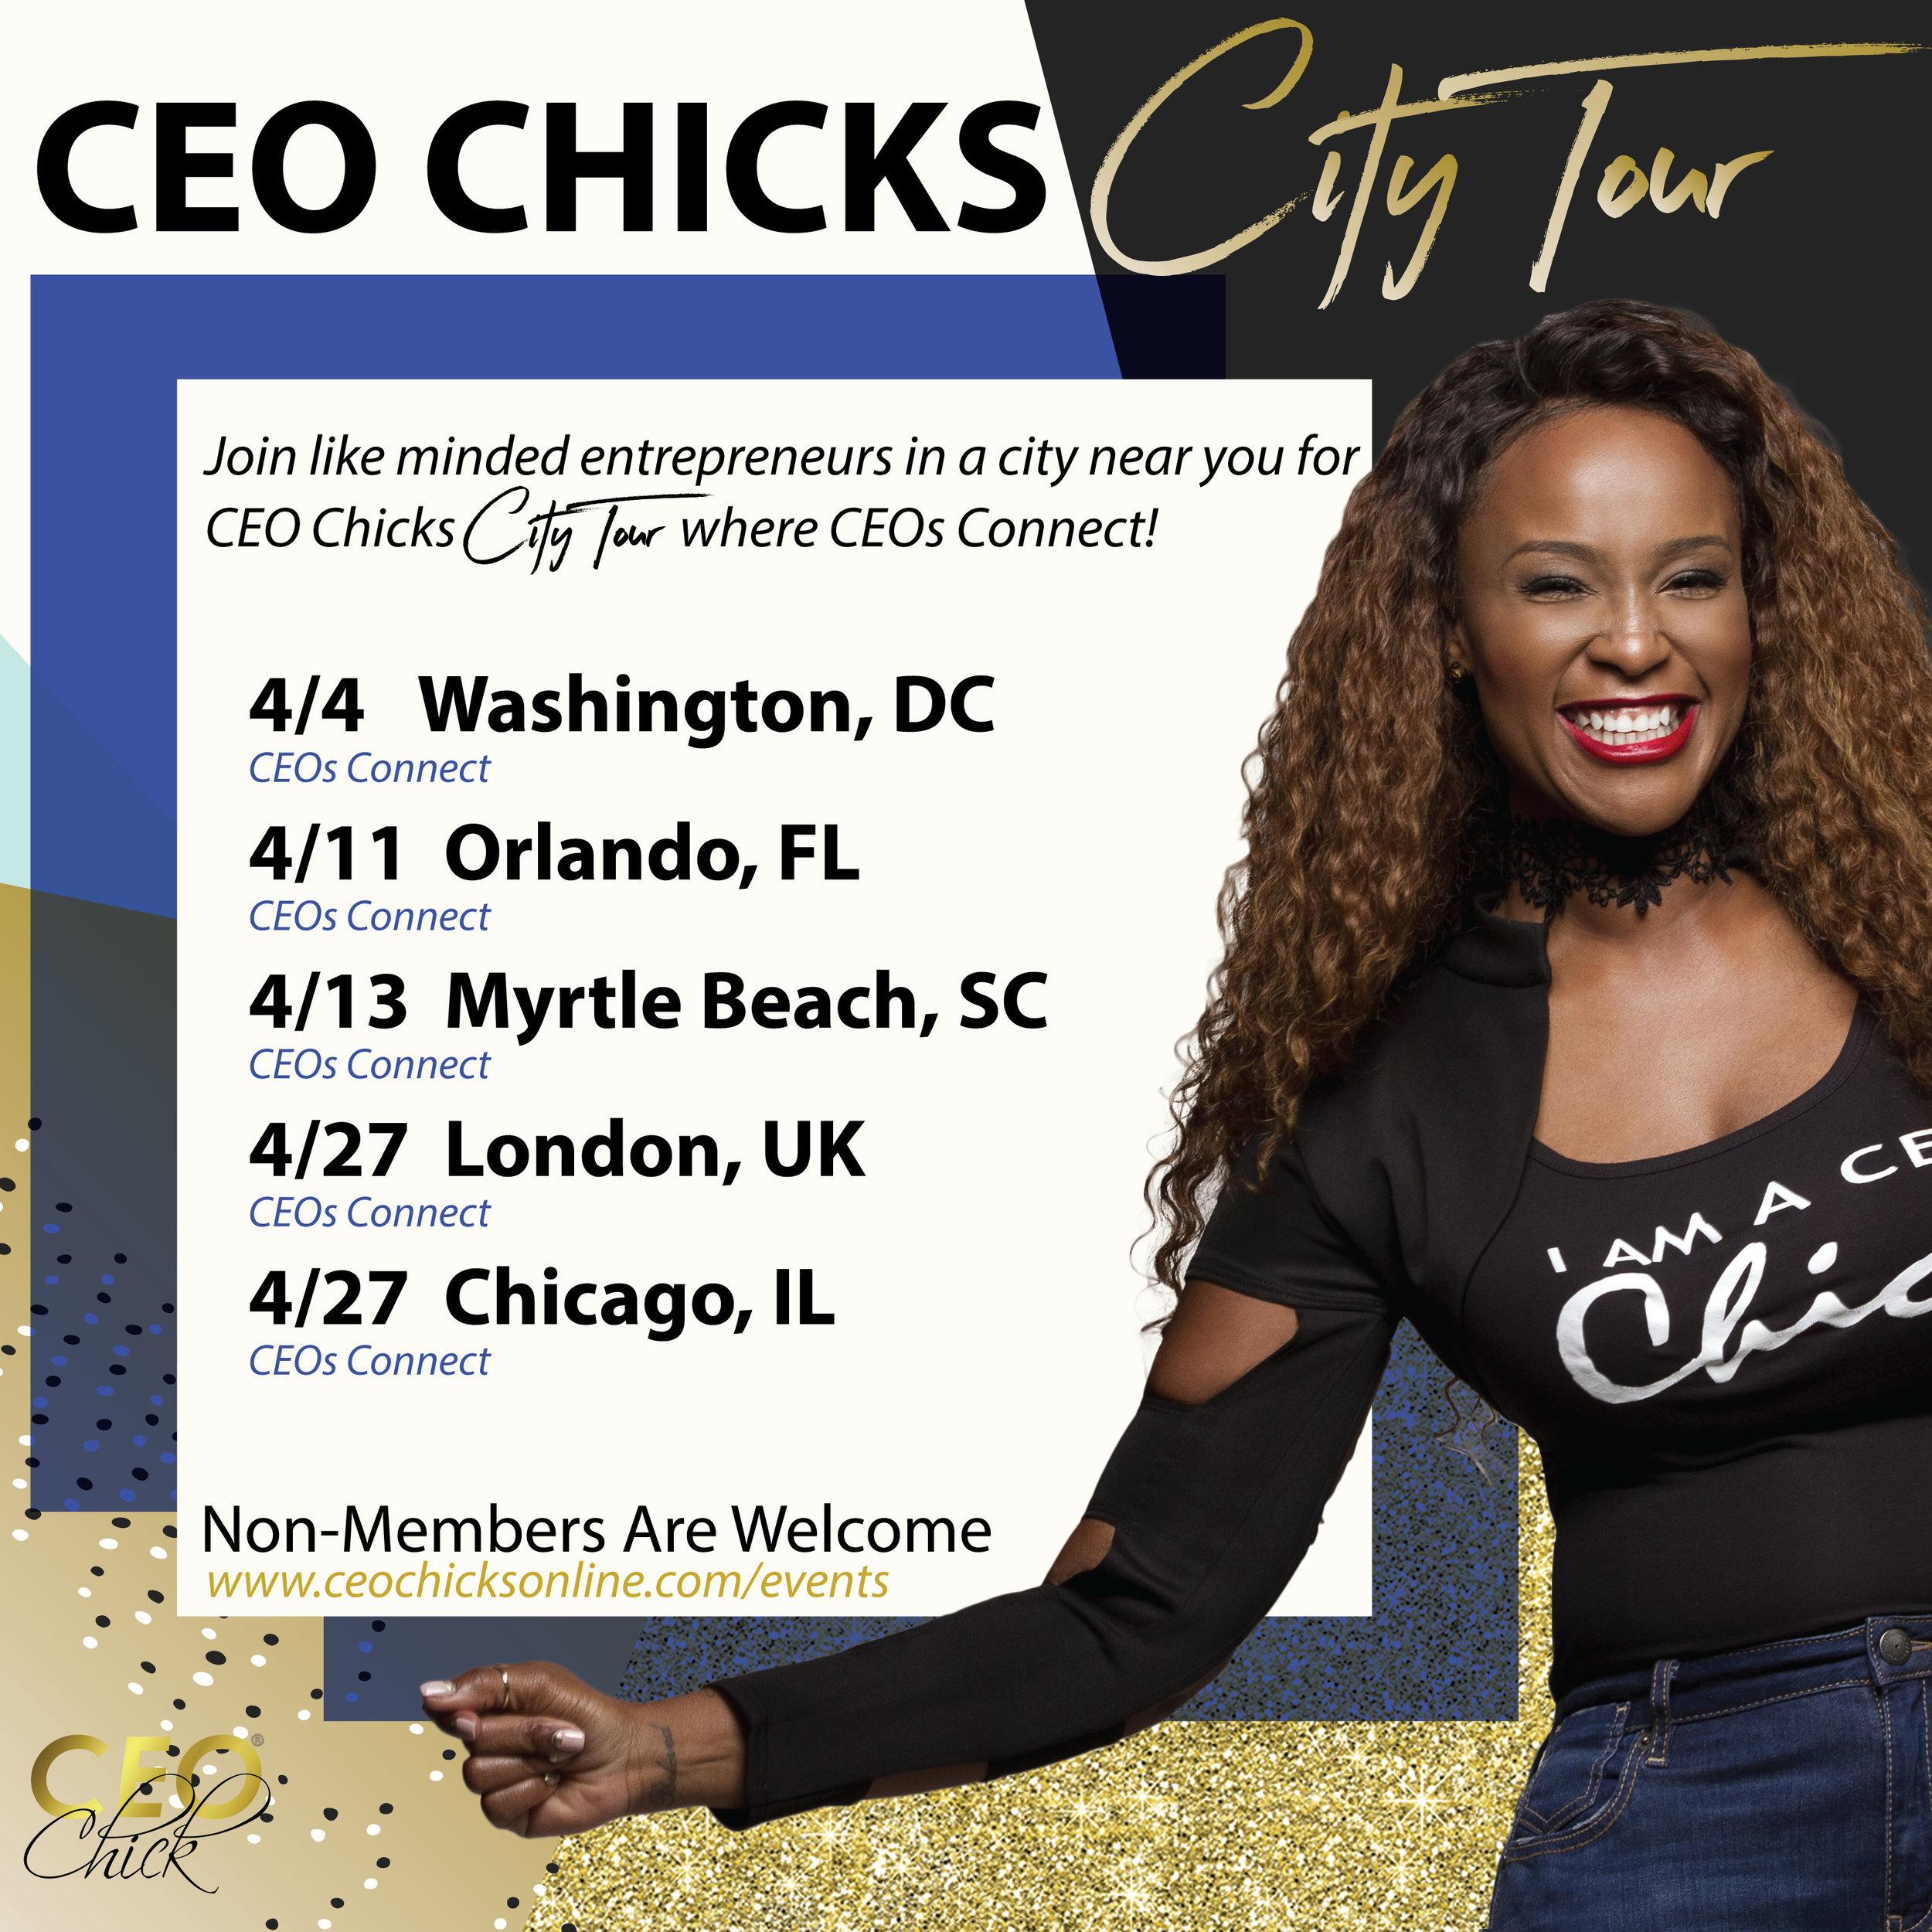 CEO-CHICK-TOUR.jpg